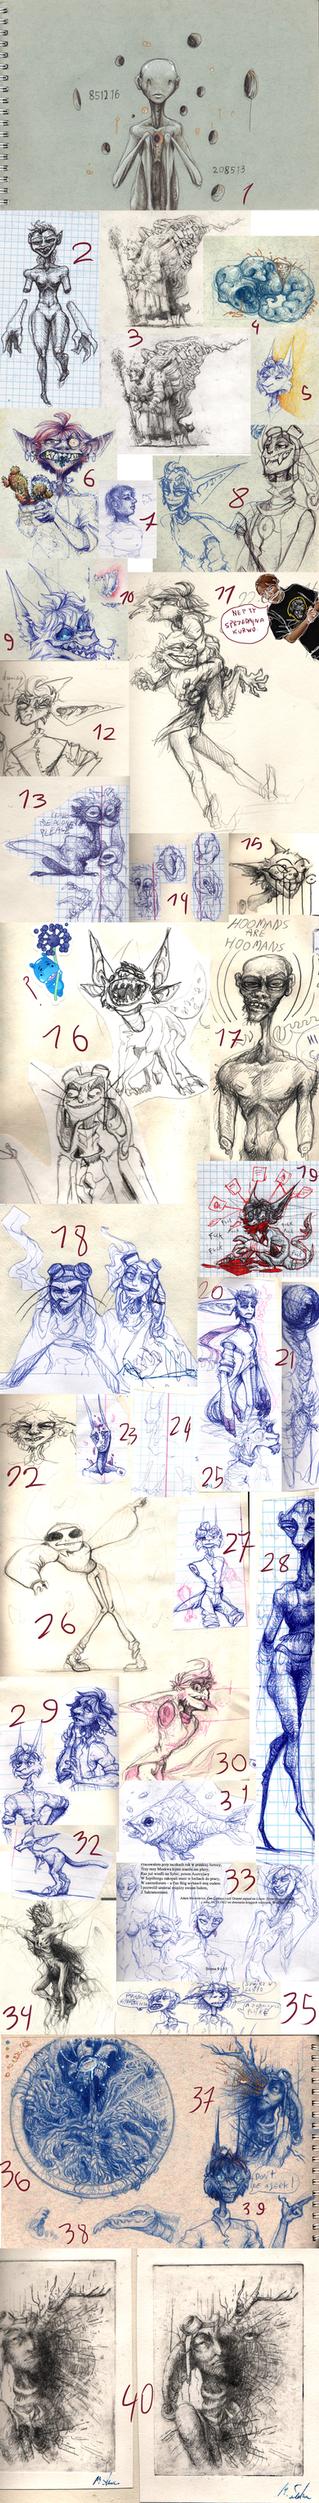 Sketch Dump - 22 by Nepook